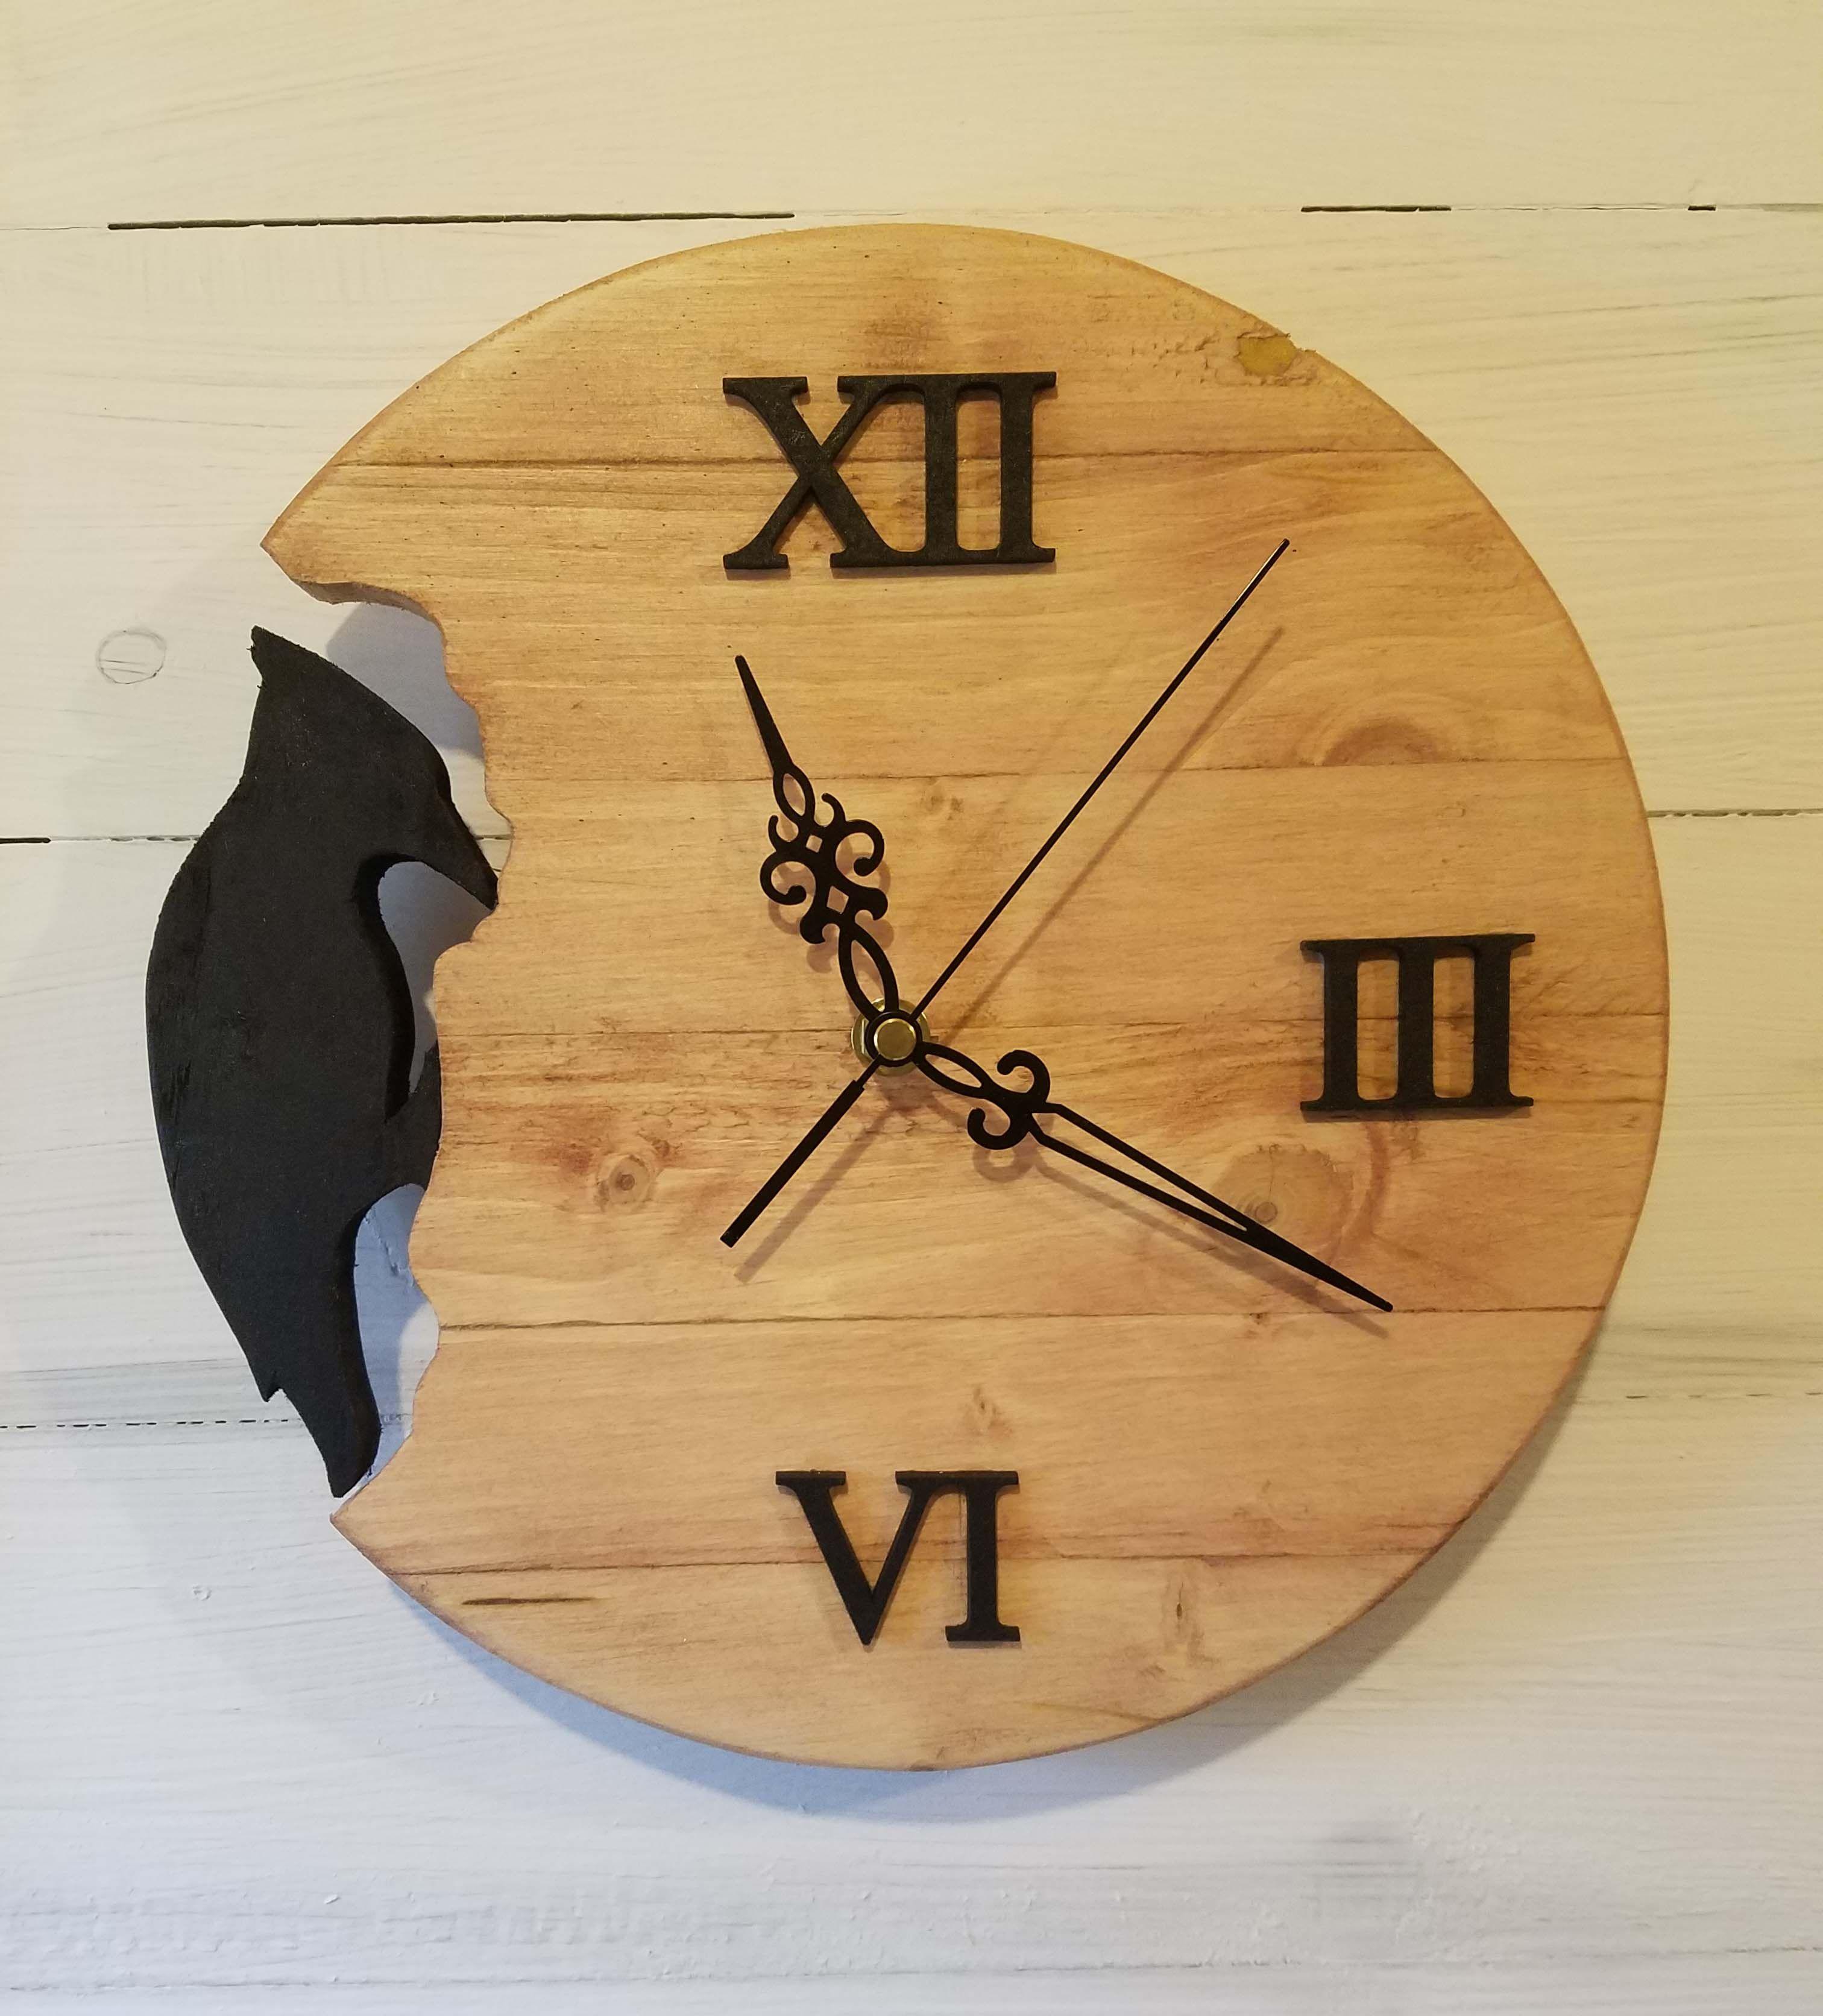 Woodpecker Wall Clock Handmade From Reclaimed Wood 28cm In Diameter Silent Quartz Movement Woodenclock Clocks Homedecor Wa In 2020 Wall Clock Clock Wooden Clock